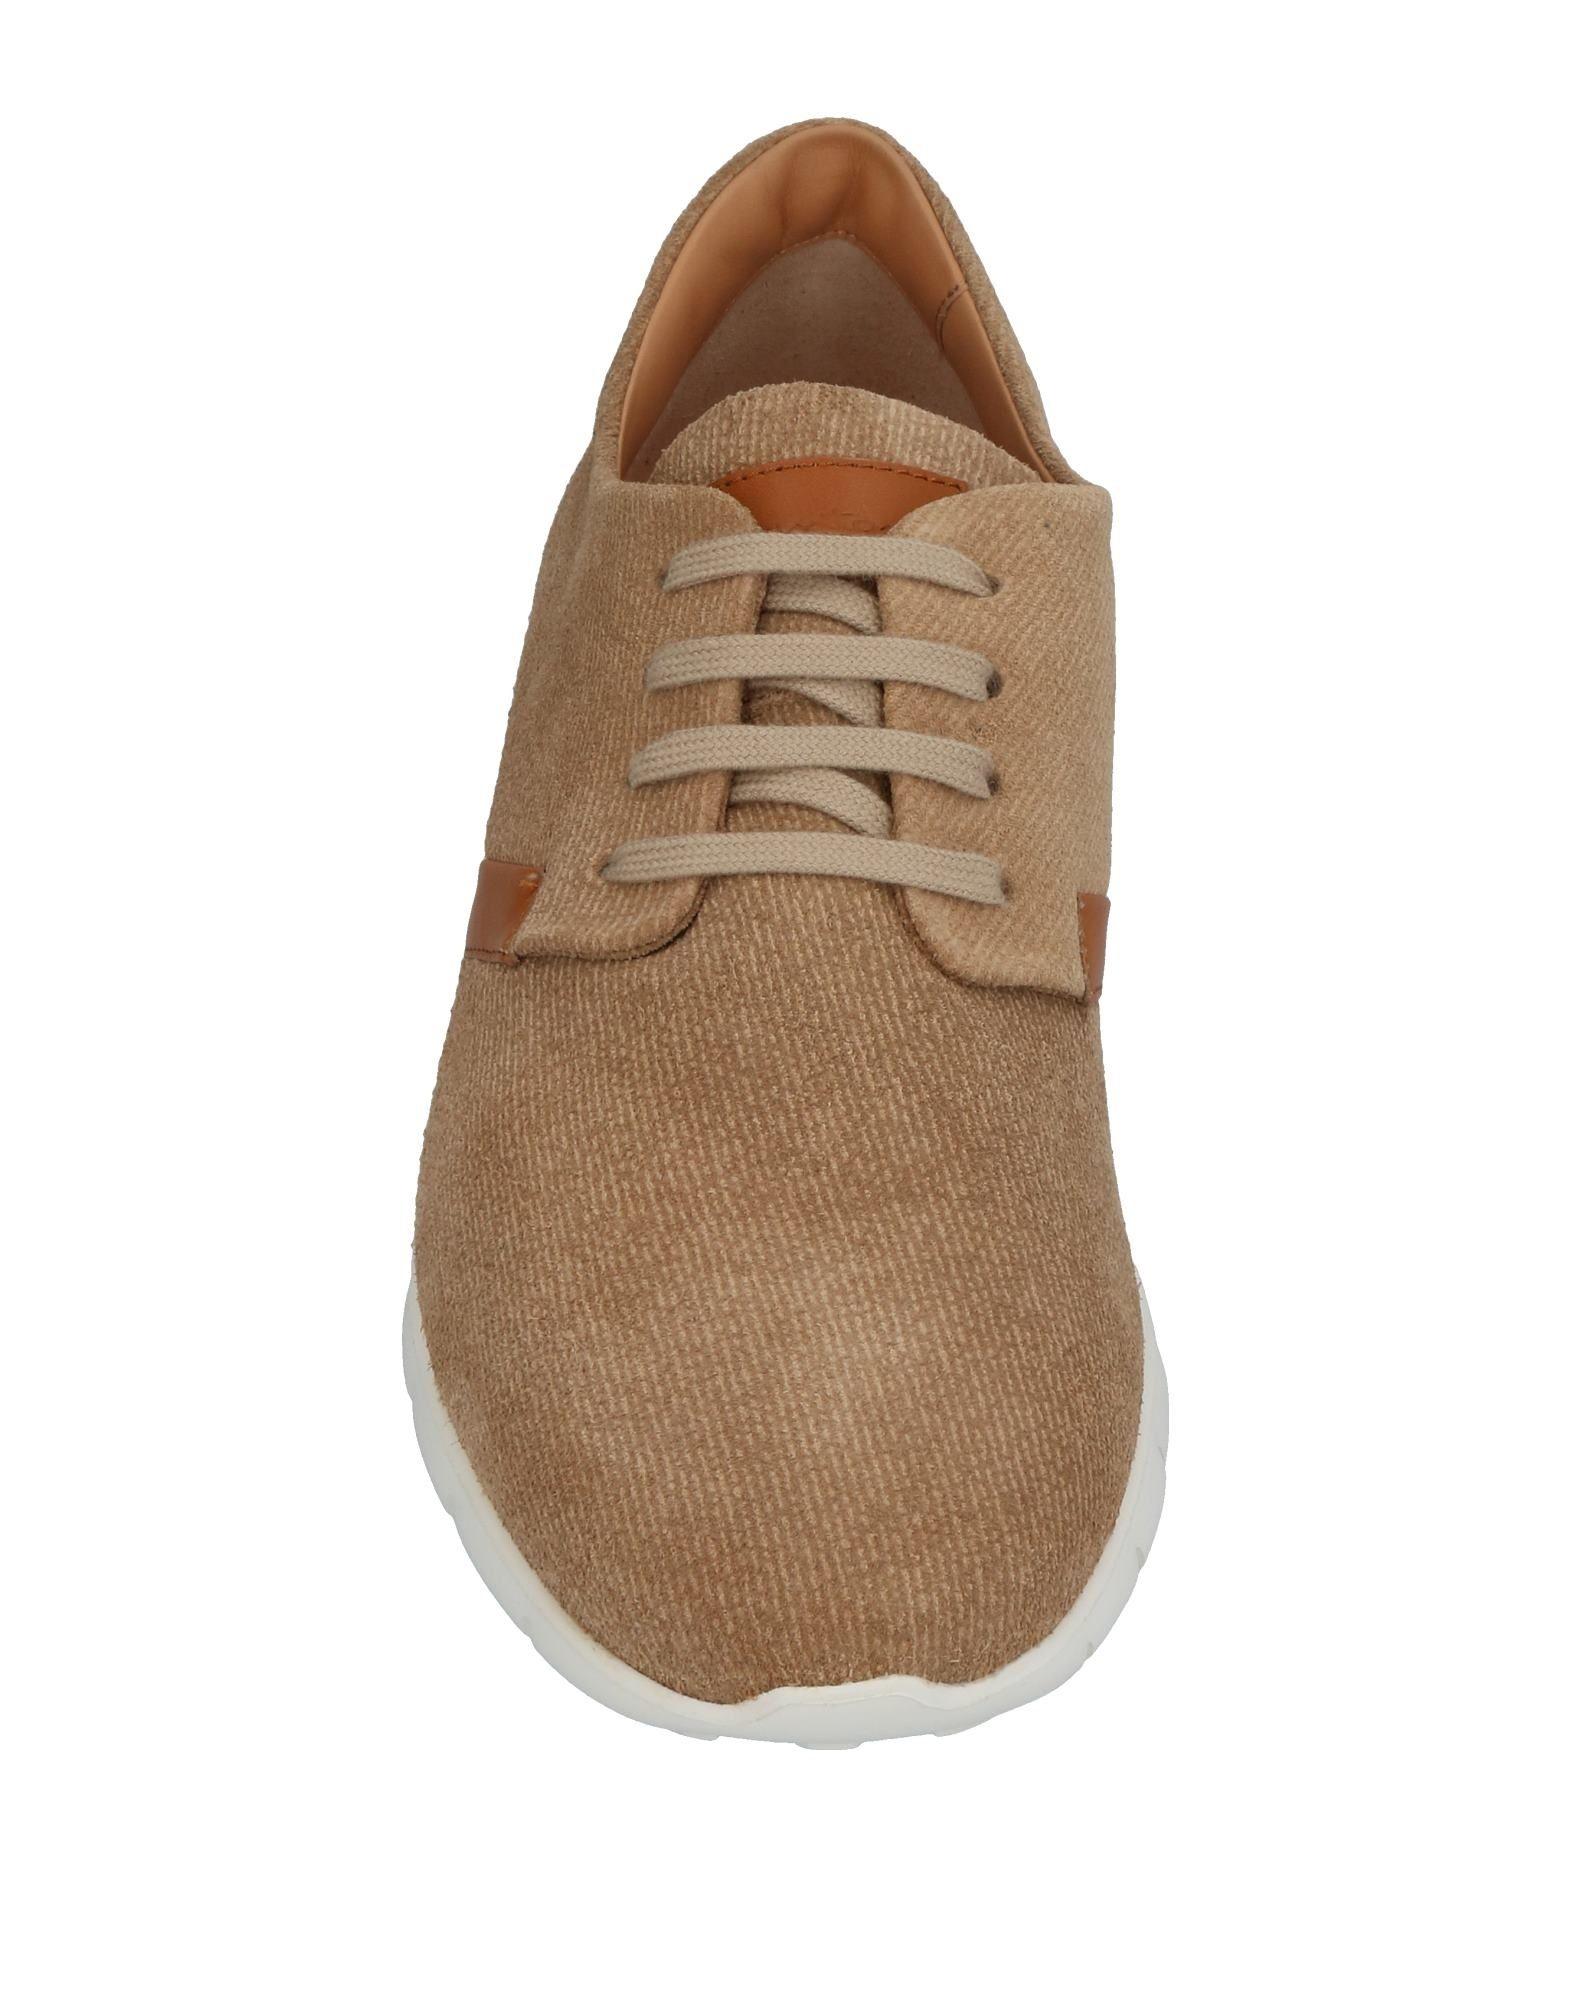 Santoni Sneakers Herren   11410109CH Heiße Schuhe 3218a3